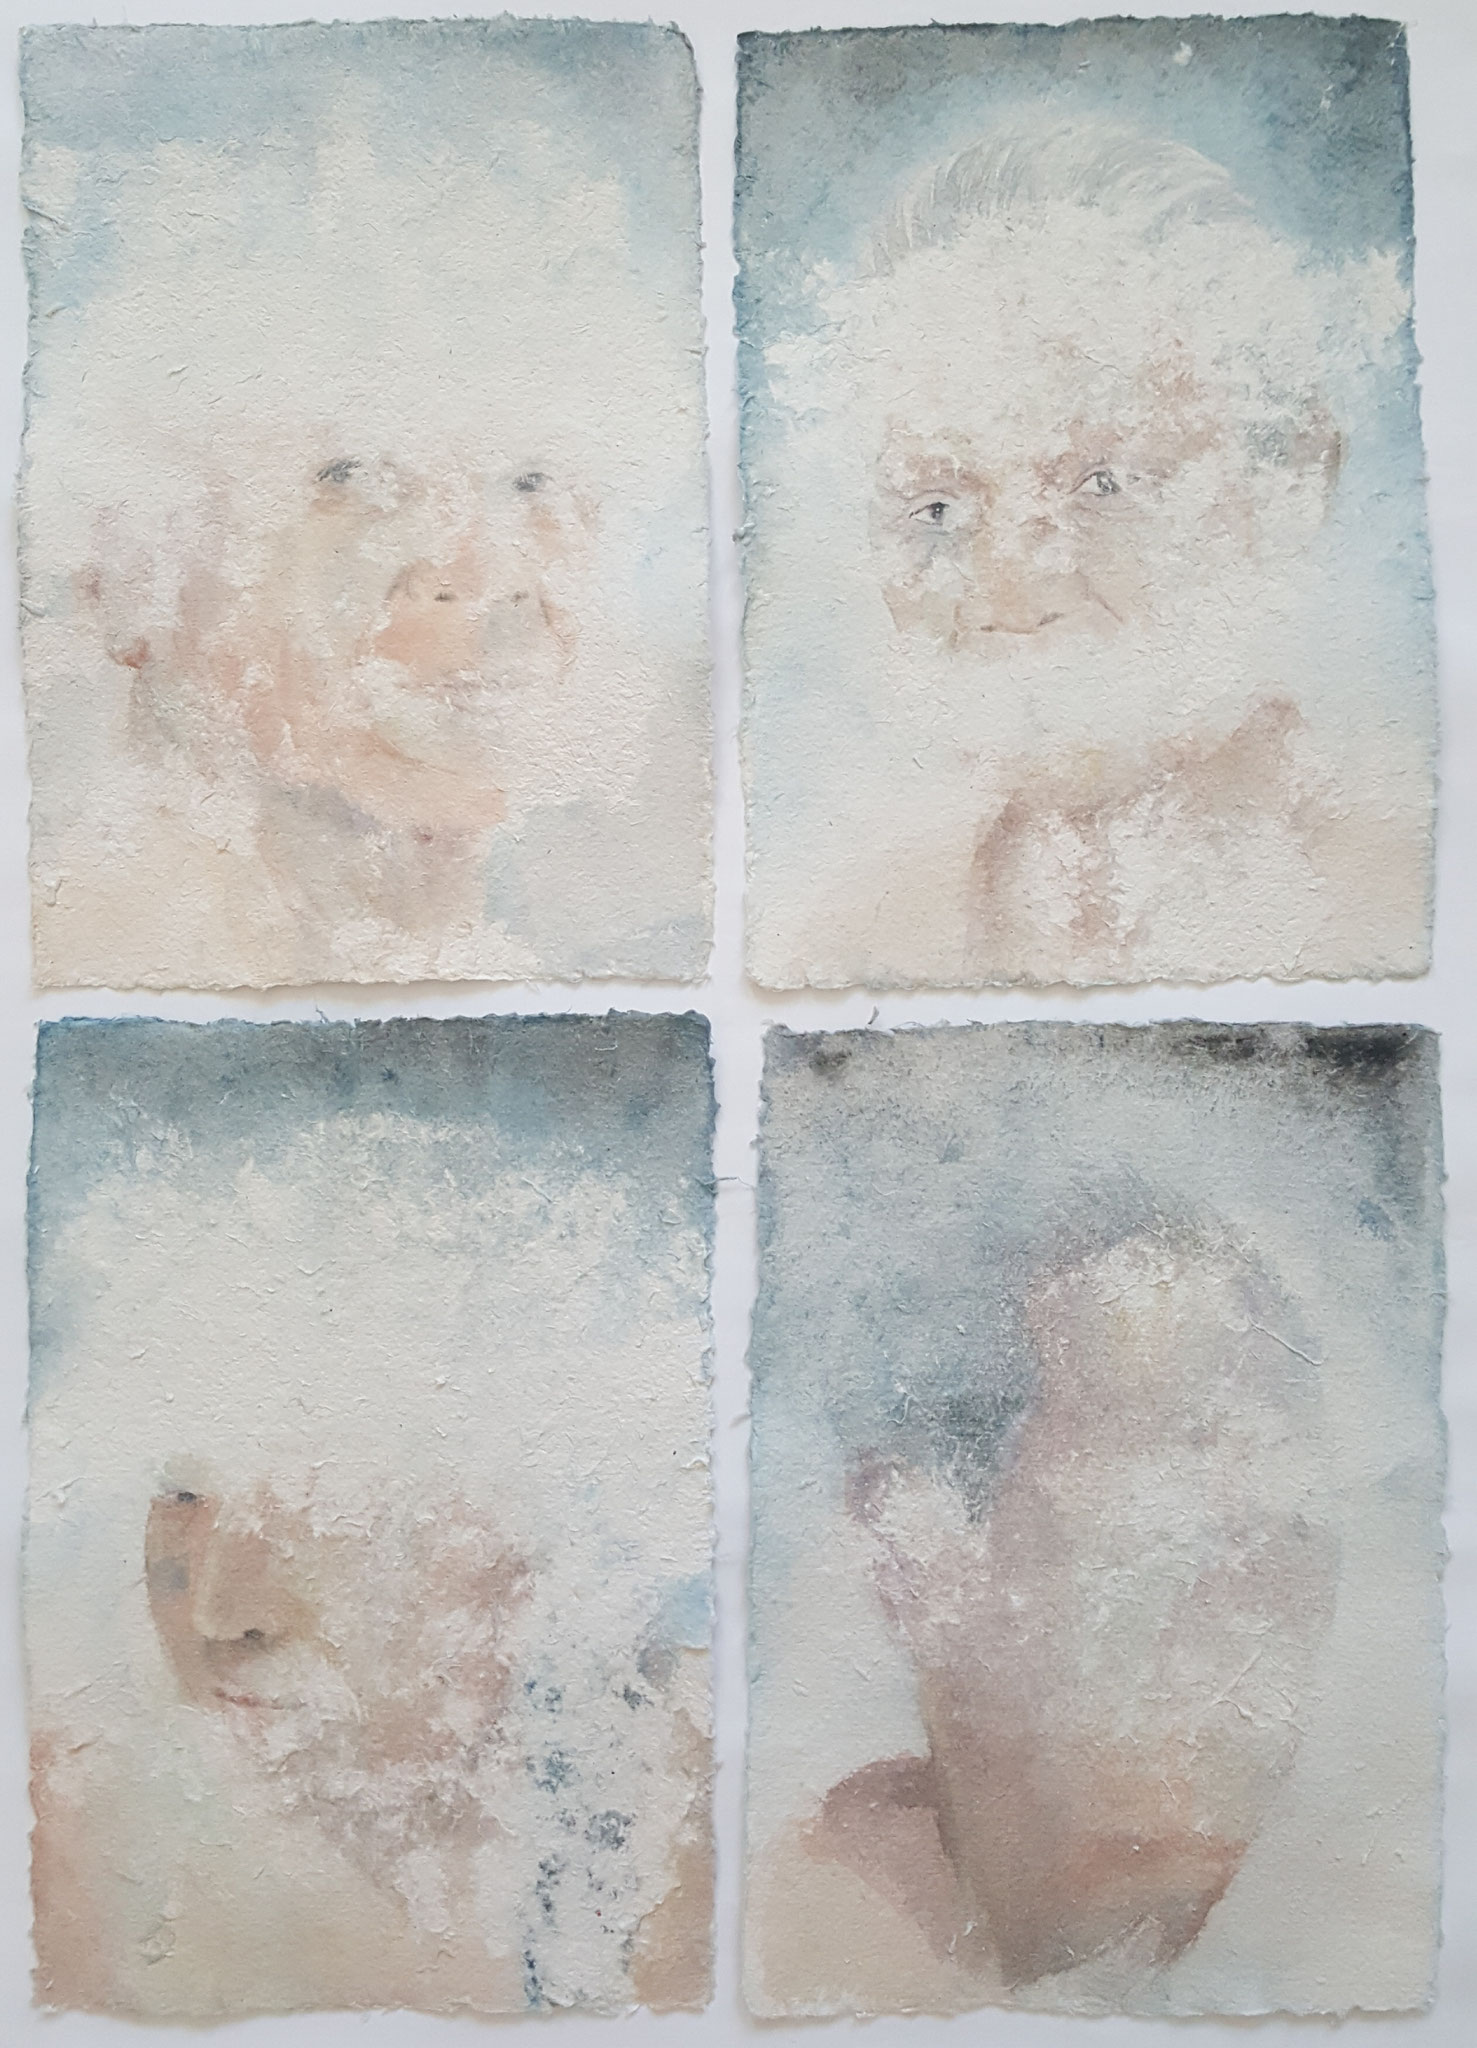 Des-aparecidos XIX, 2018, Polyptichon á 20 x 30 cm, Aquarell on paper